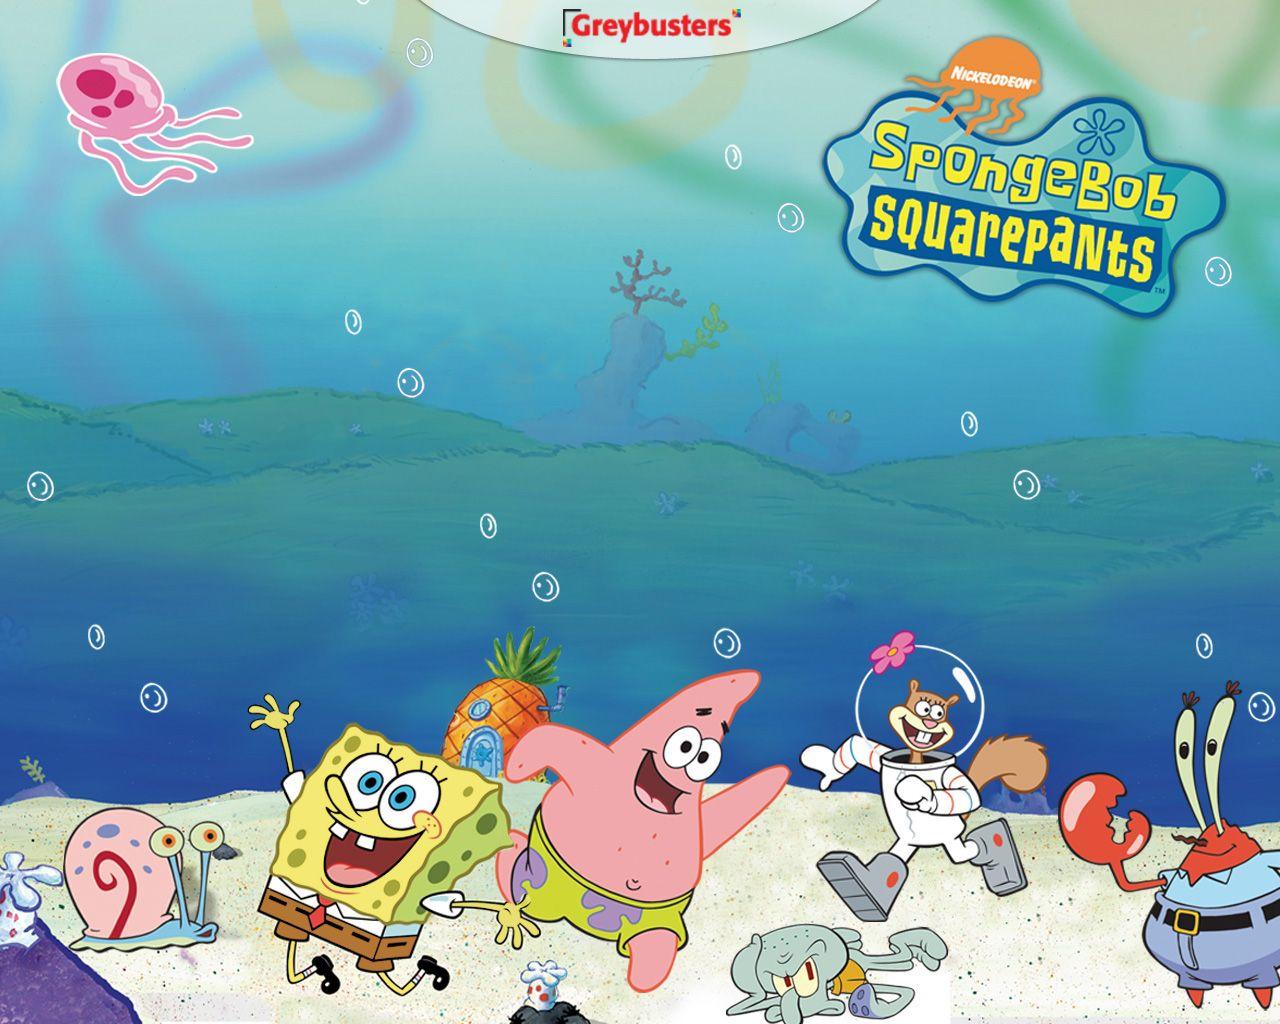 spongebob squarepants wallpaper with